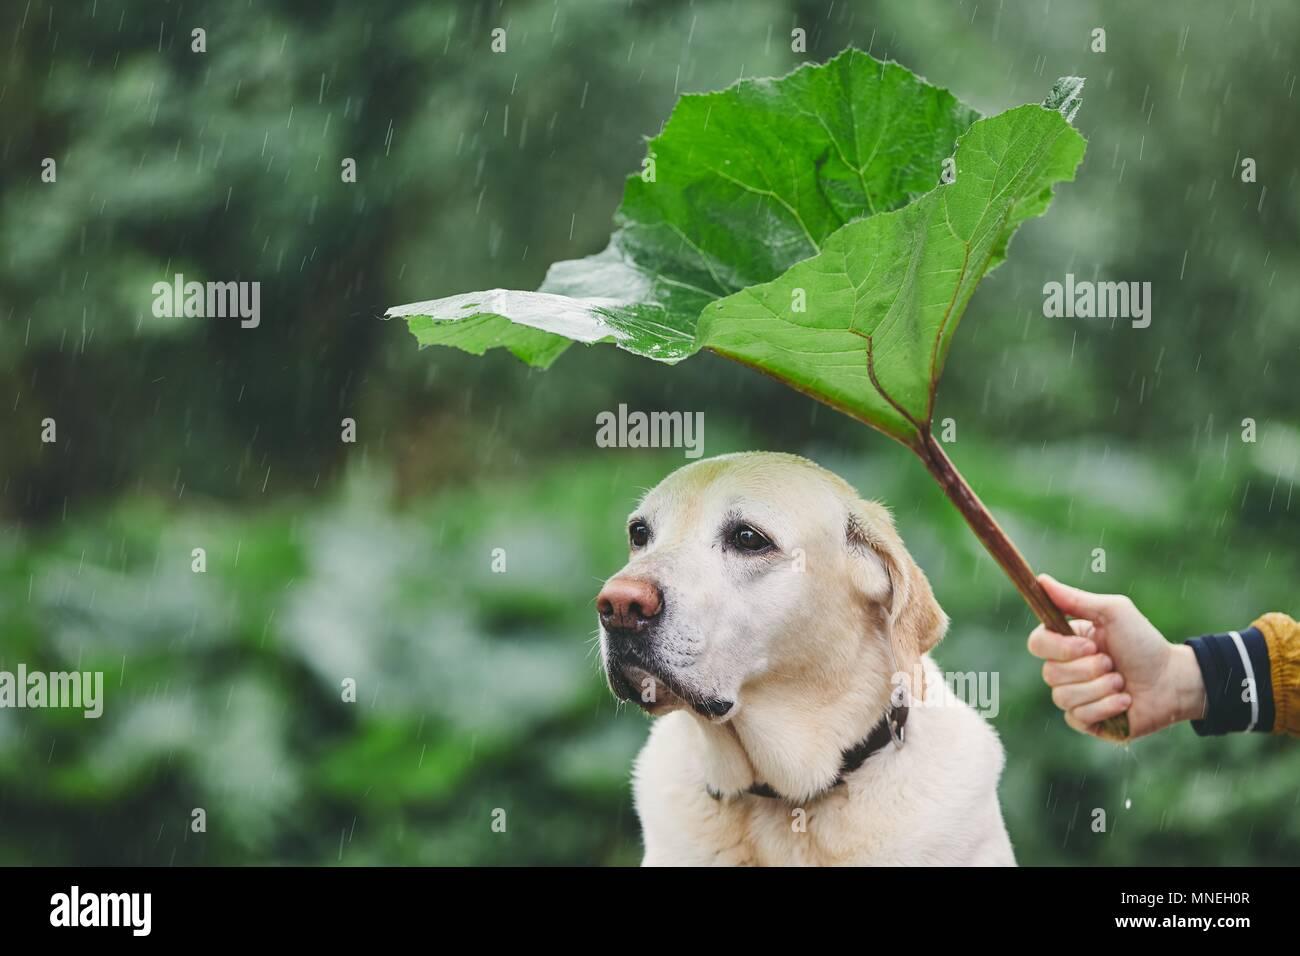 Raindrop Leaf Stock Photos & Raindrop Leaf Stock Images ...